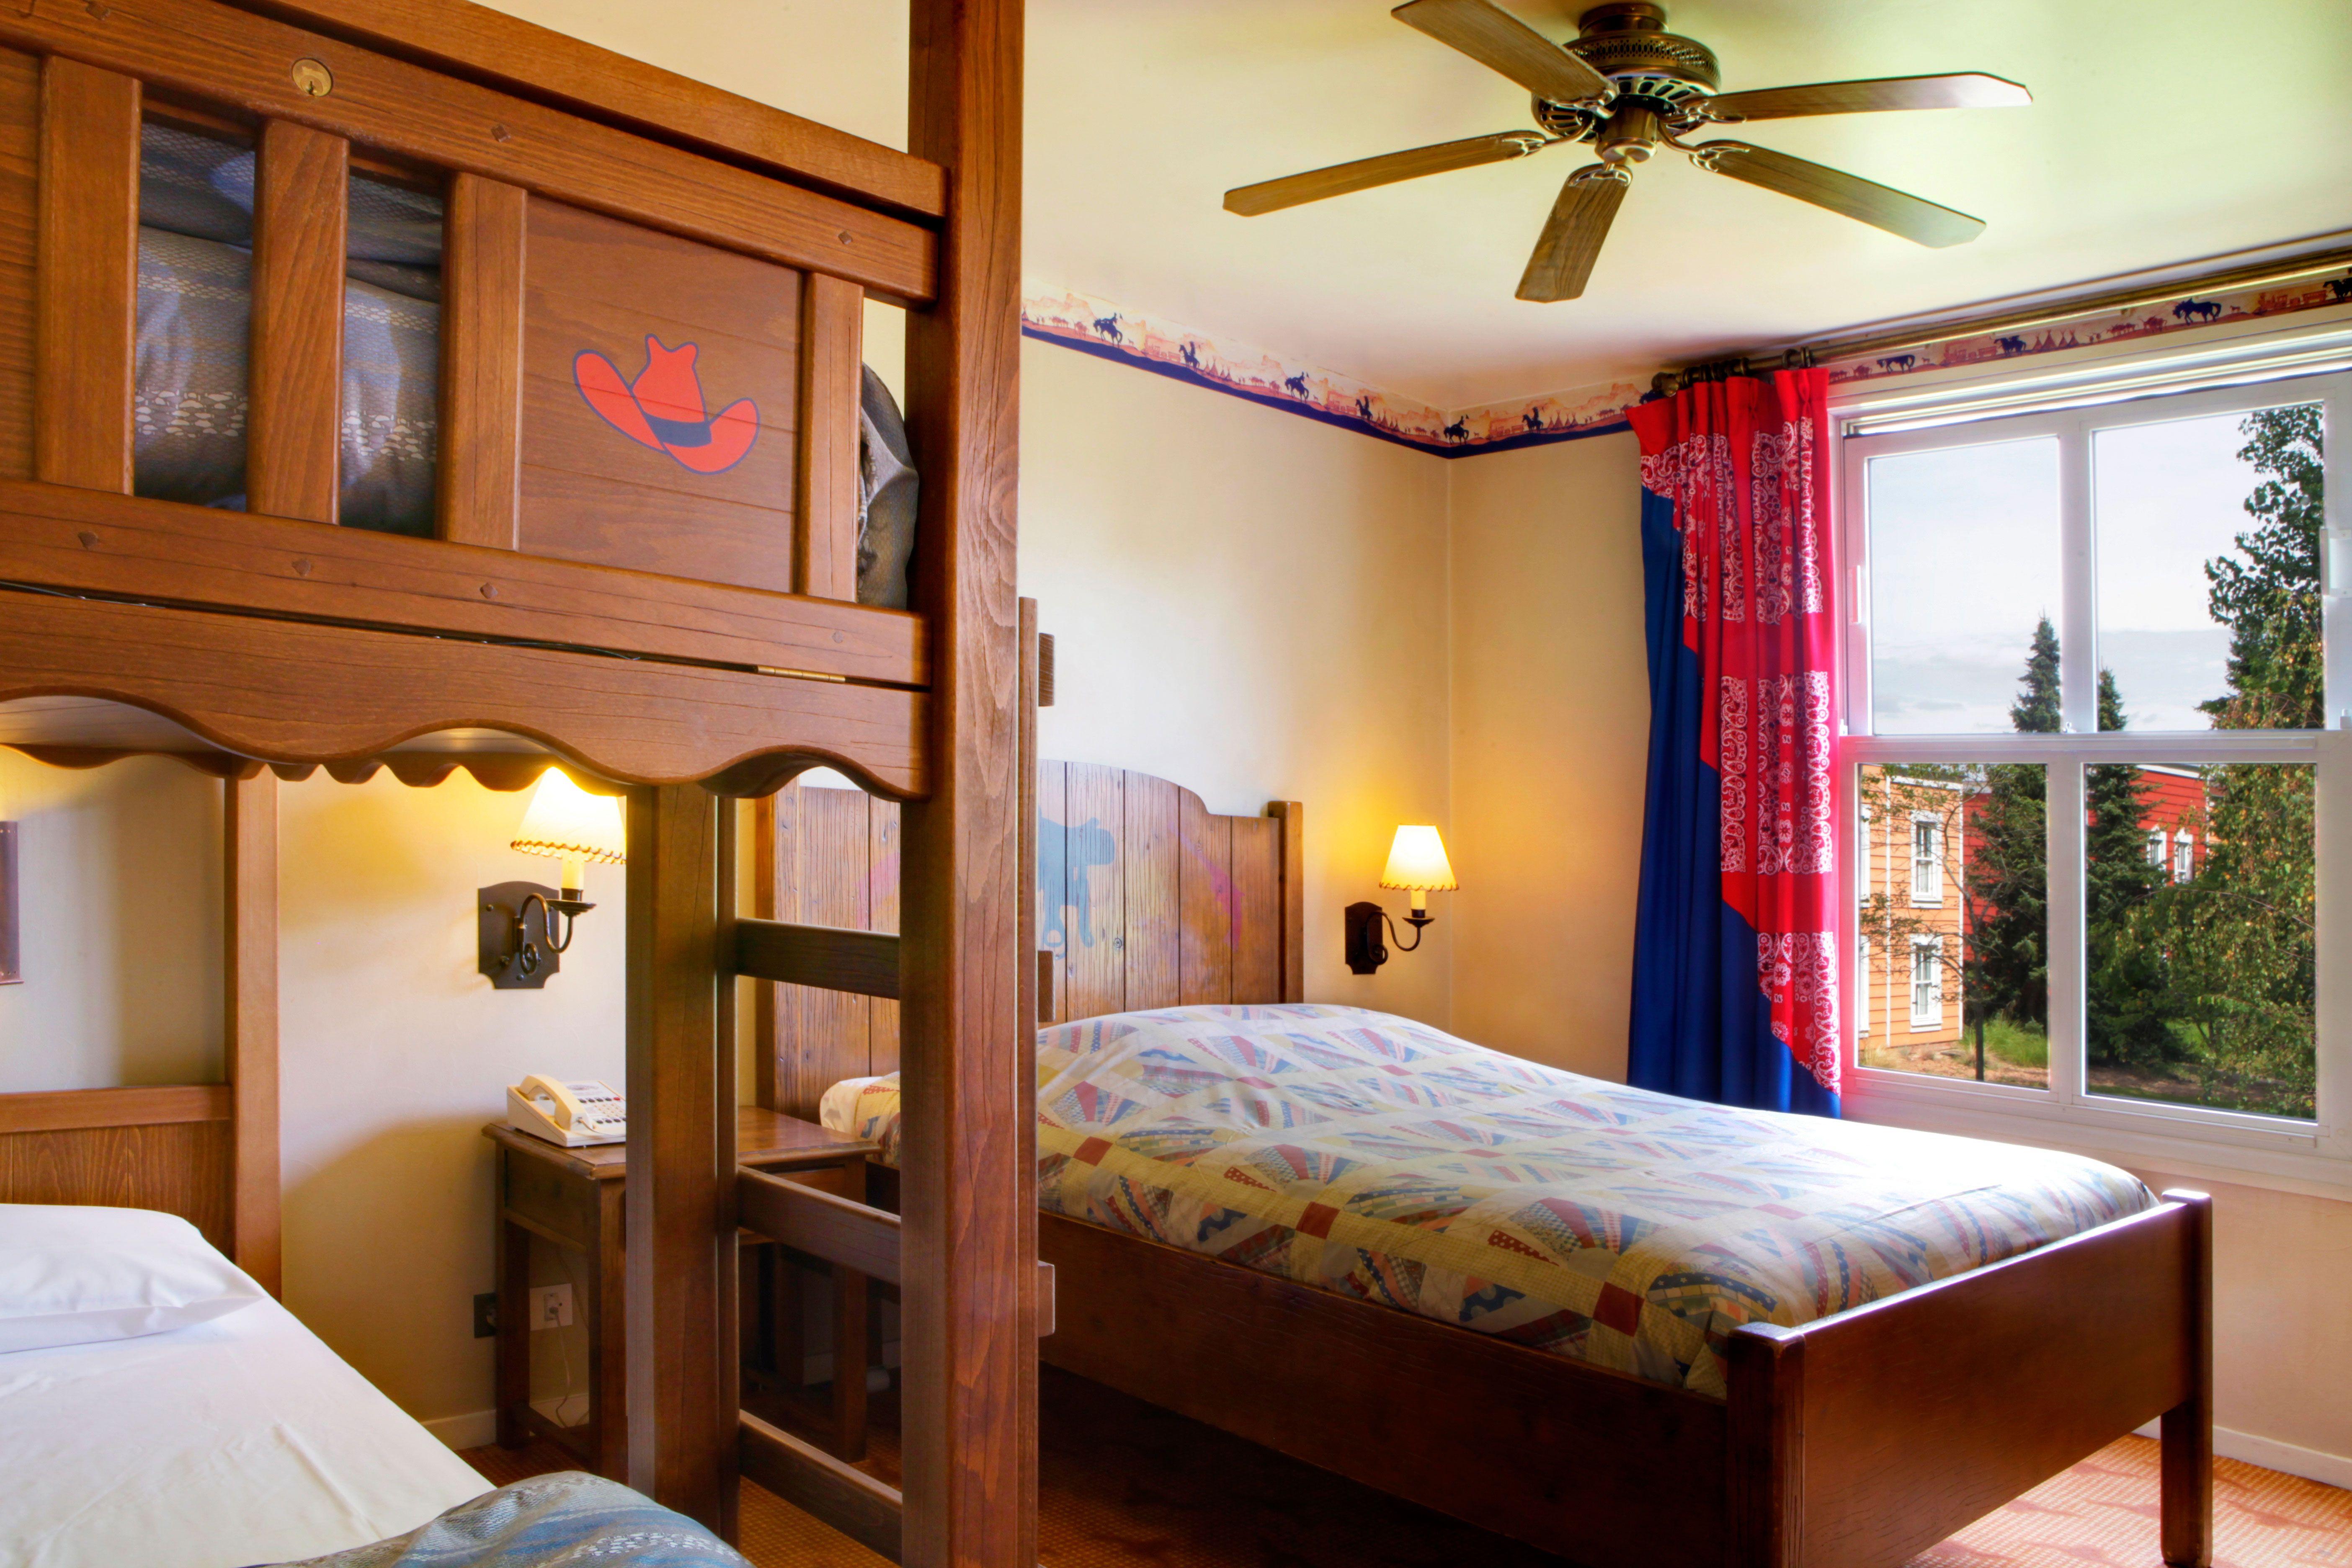 Disney Hotels Hotel Cheyenne Standard Room Disneyland Paris